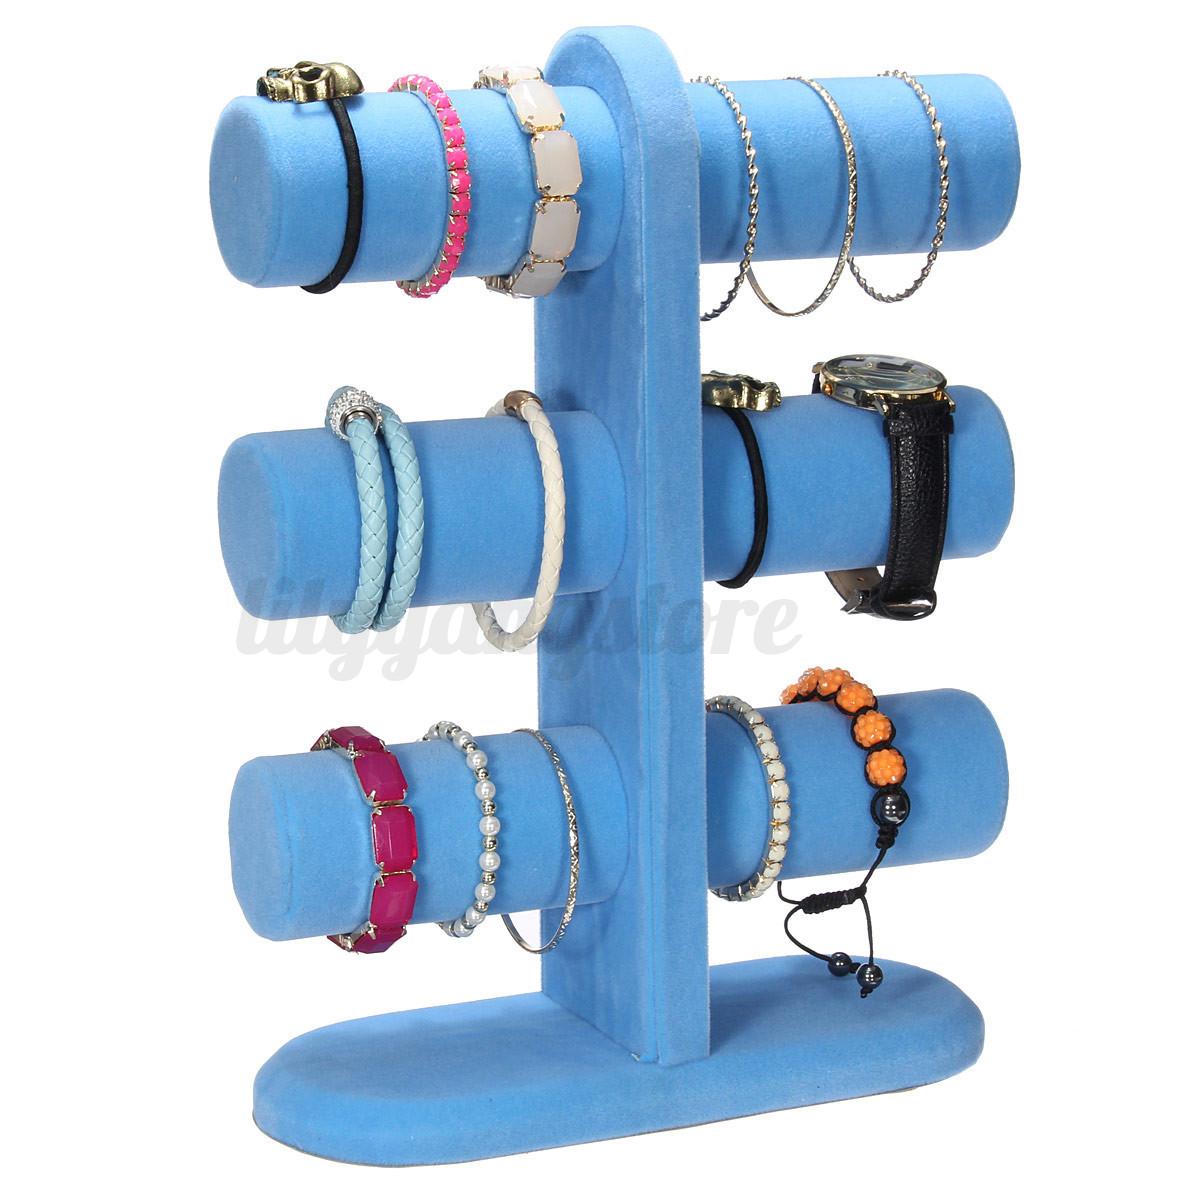 Hot 3 Tier Velvet Jewelry Display Stand Holder Bracelet